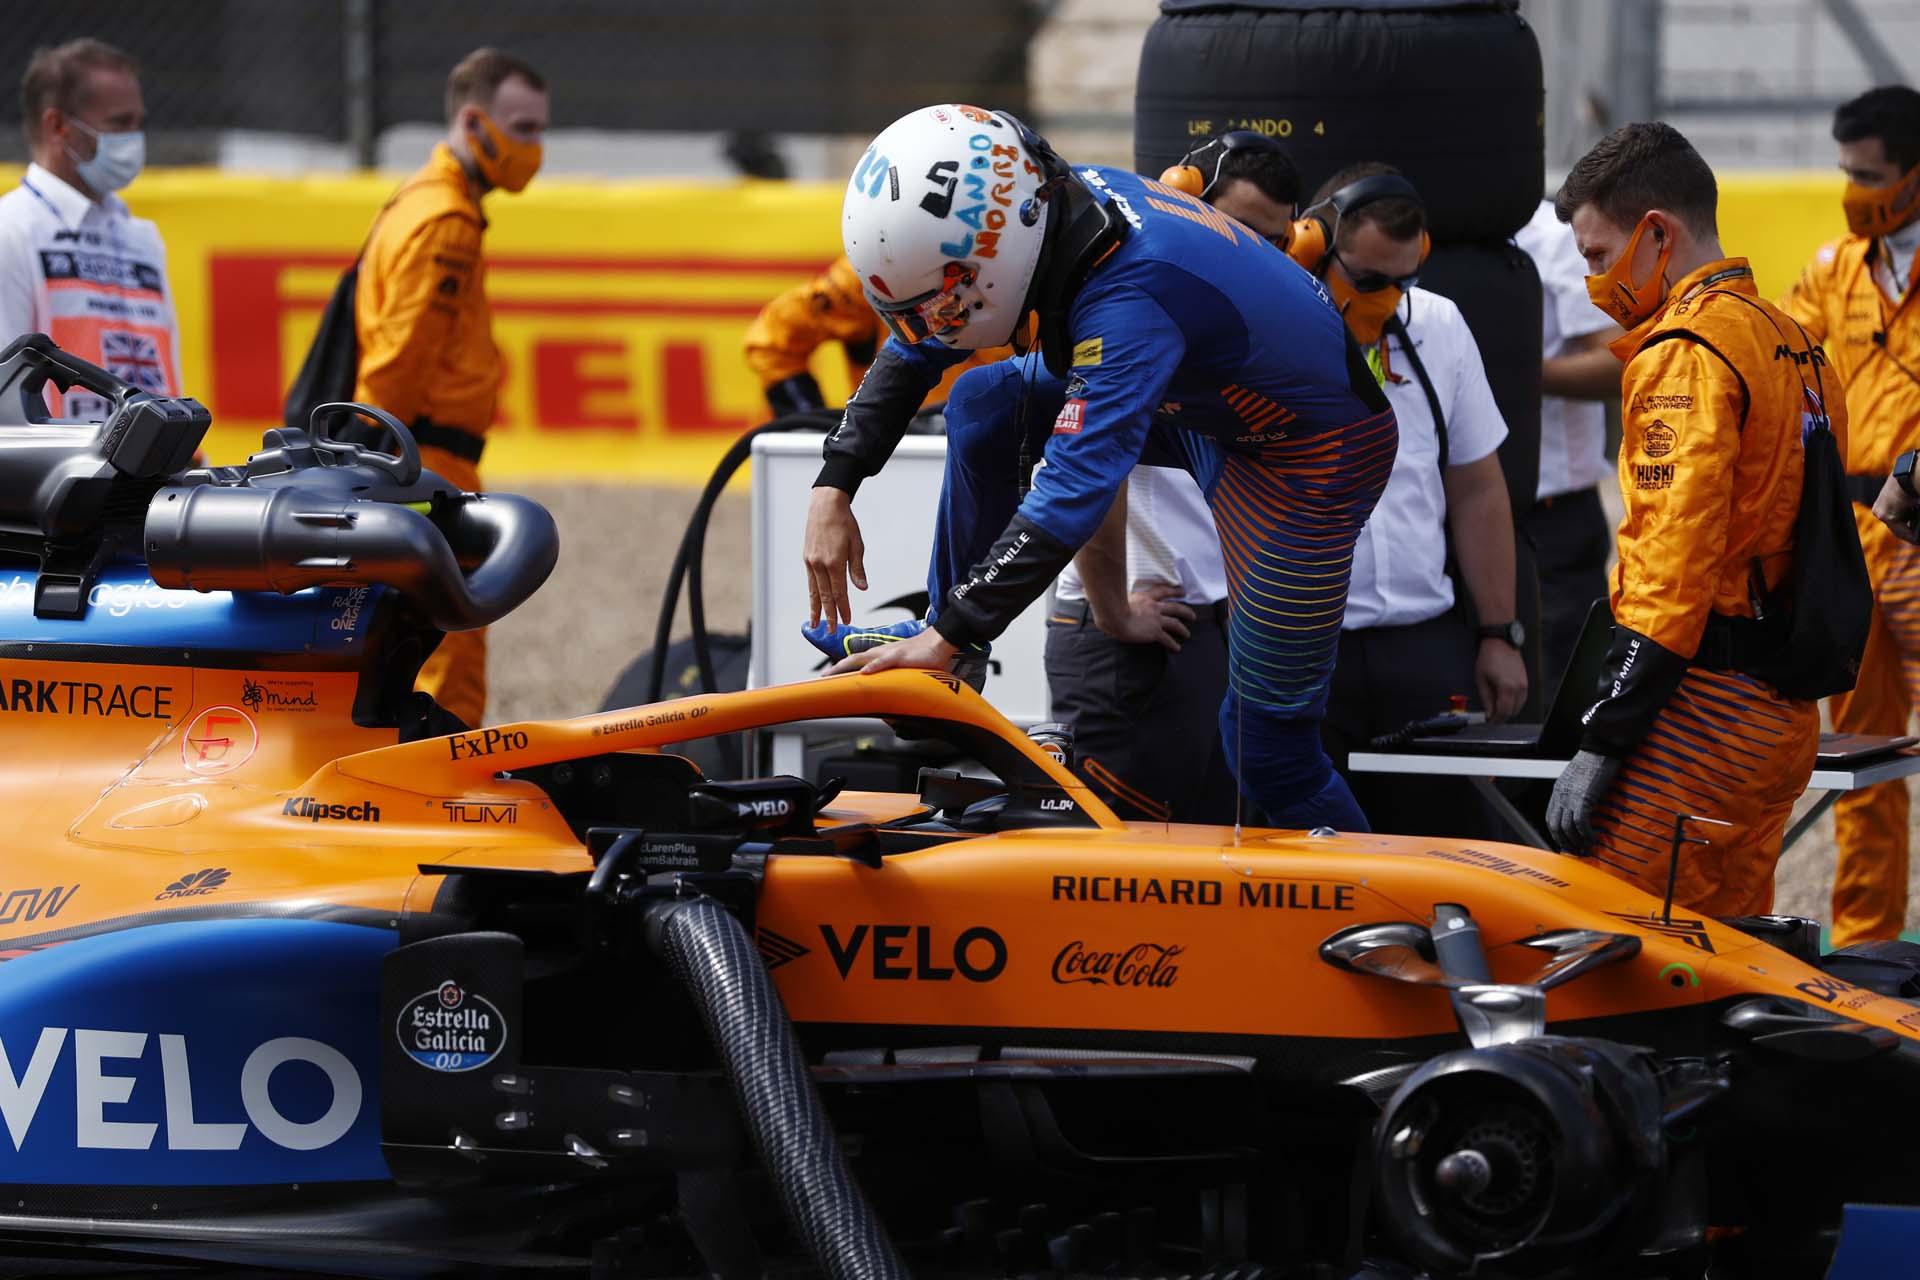 Lando Norris, McLaren, enters his car on the grid